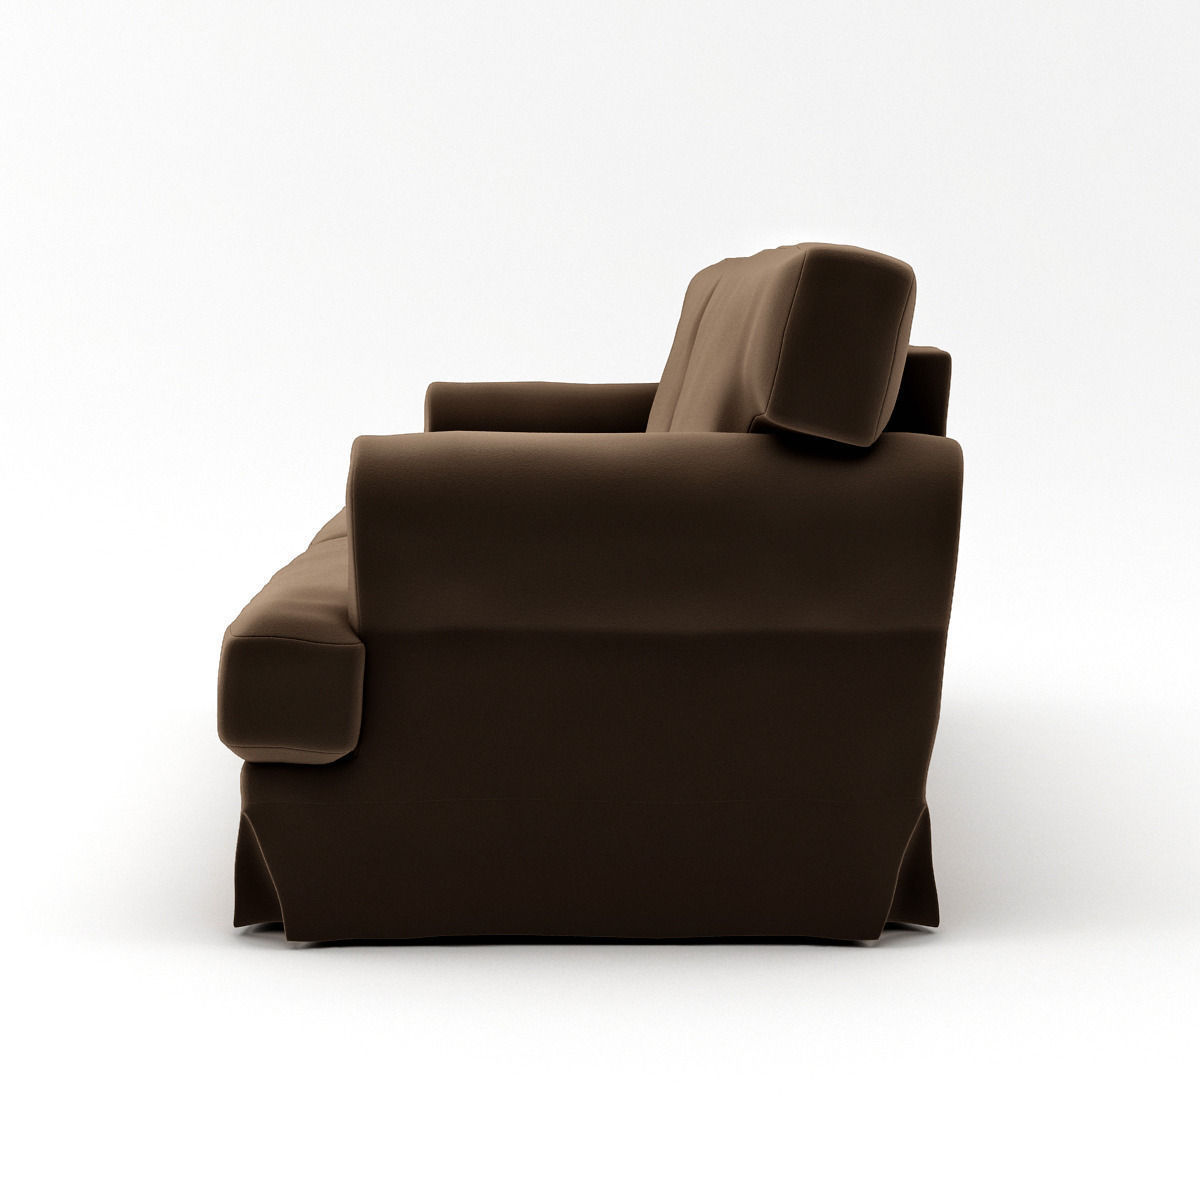 ikea ekeskog sofa for sale ballard designs sectional 3d model max cgtrader